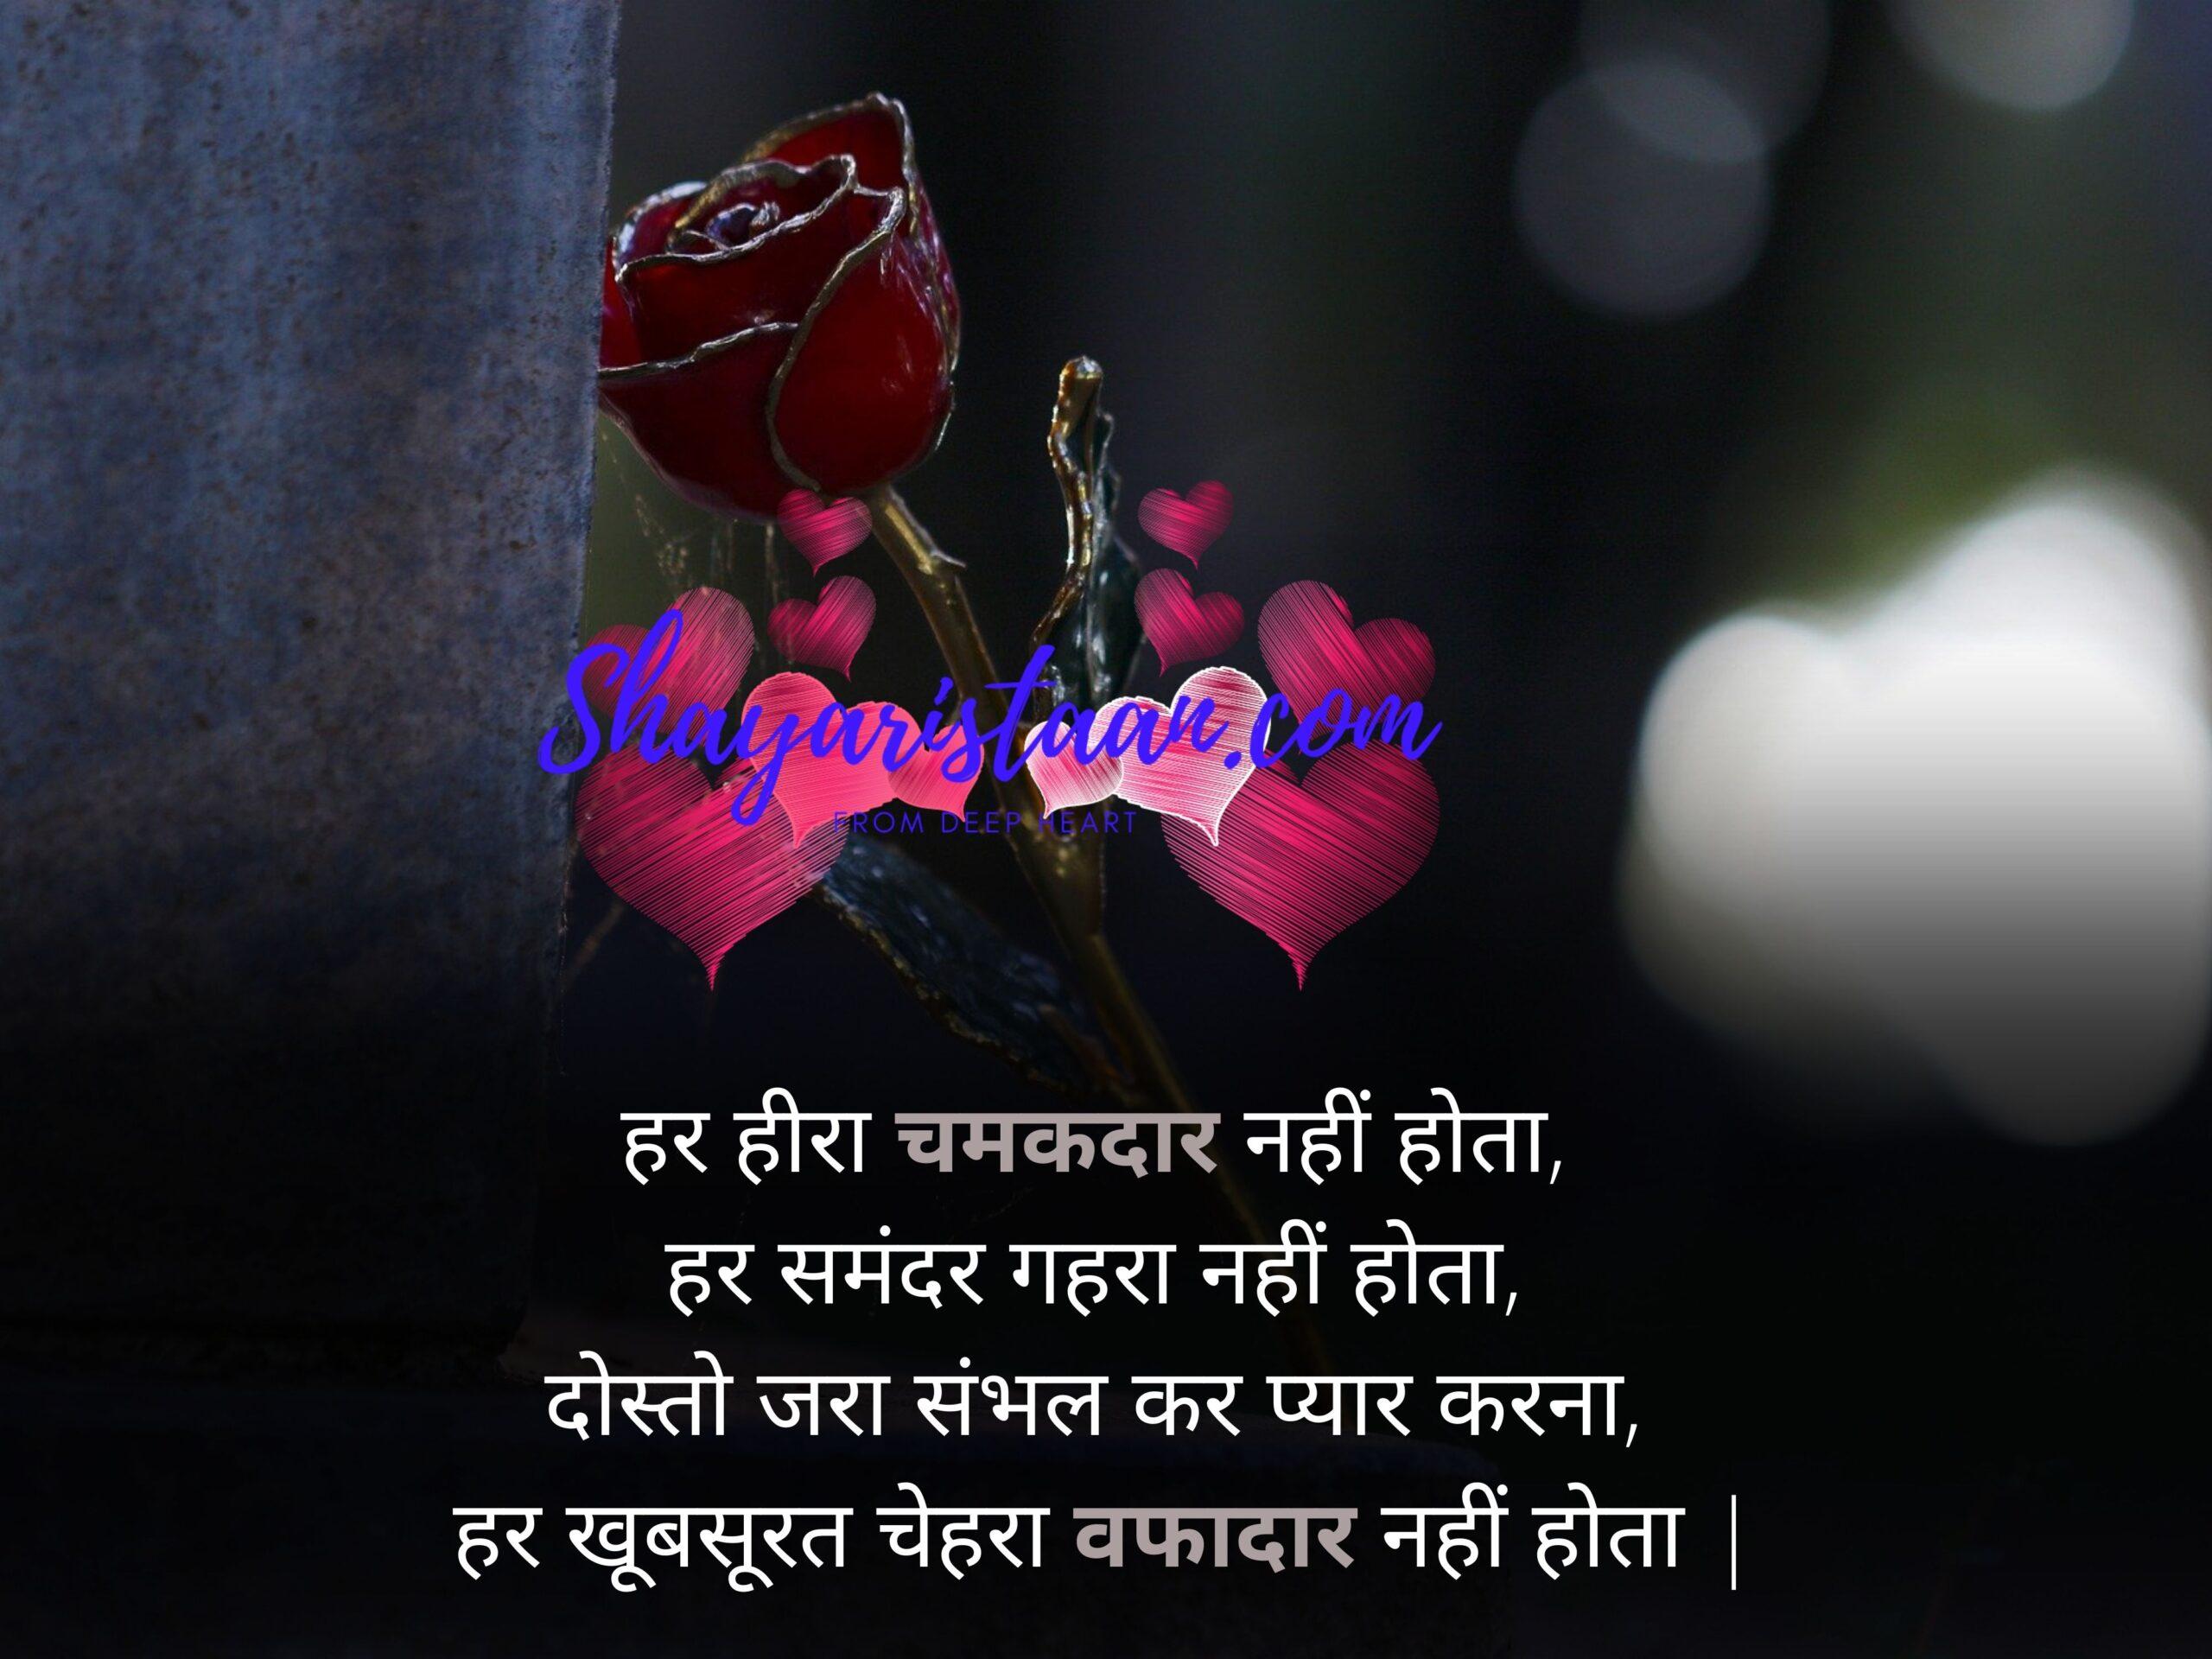 bewafa ki shayari  | हर हीरा चमकदार नहीं होता,  हर समंदर गहरा नहीं होता,  दोस्तो जरा संभल कर प्यार करना,  हर खूबसूरत चेहरा वफादार नहीं होता |